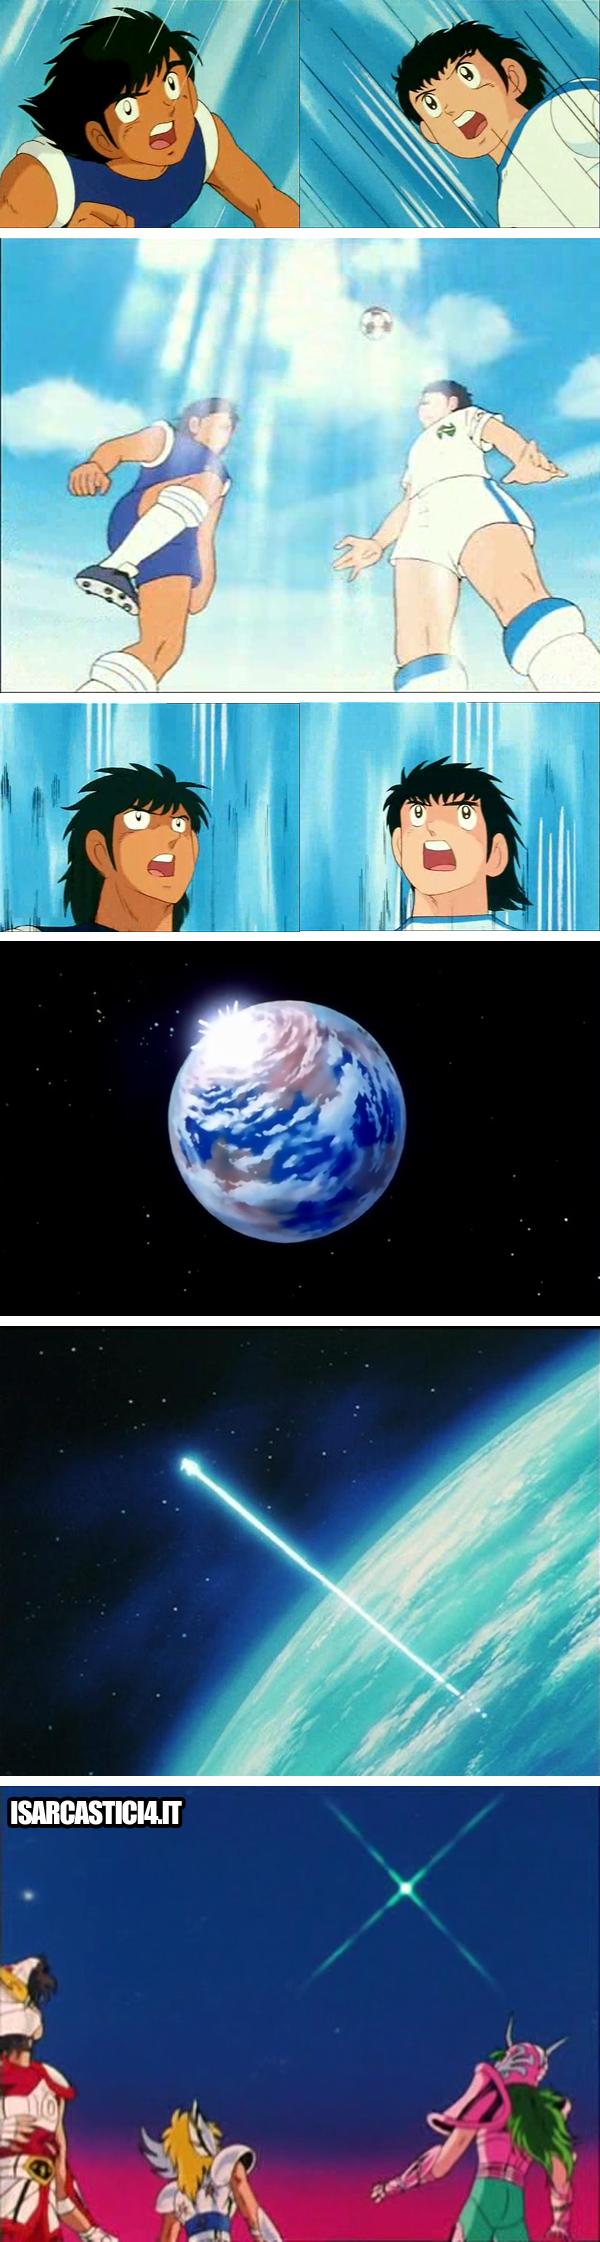 Holly & Benji, Capitan Tsubasa meme ita - Gioco aereo